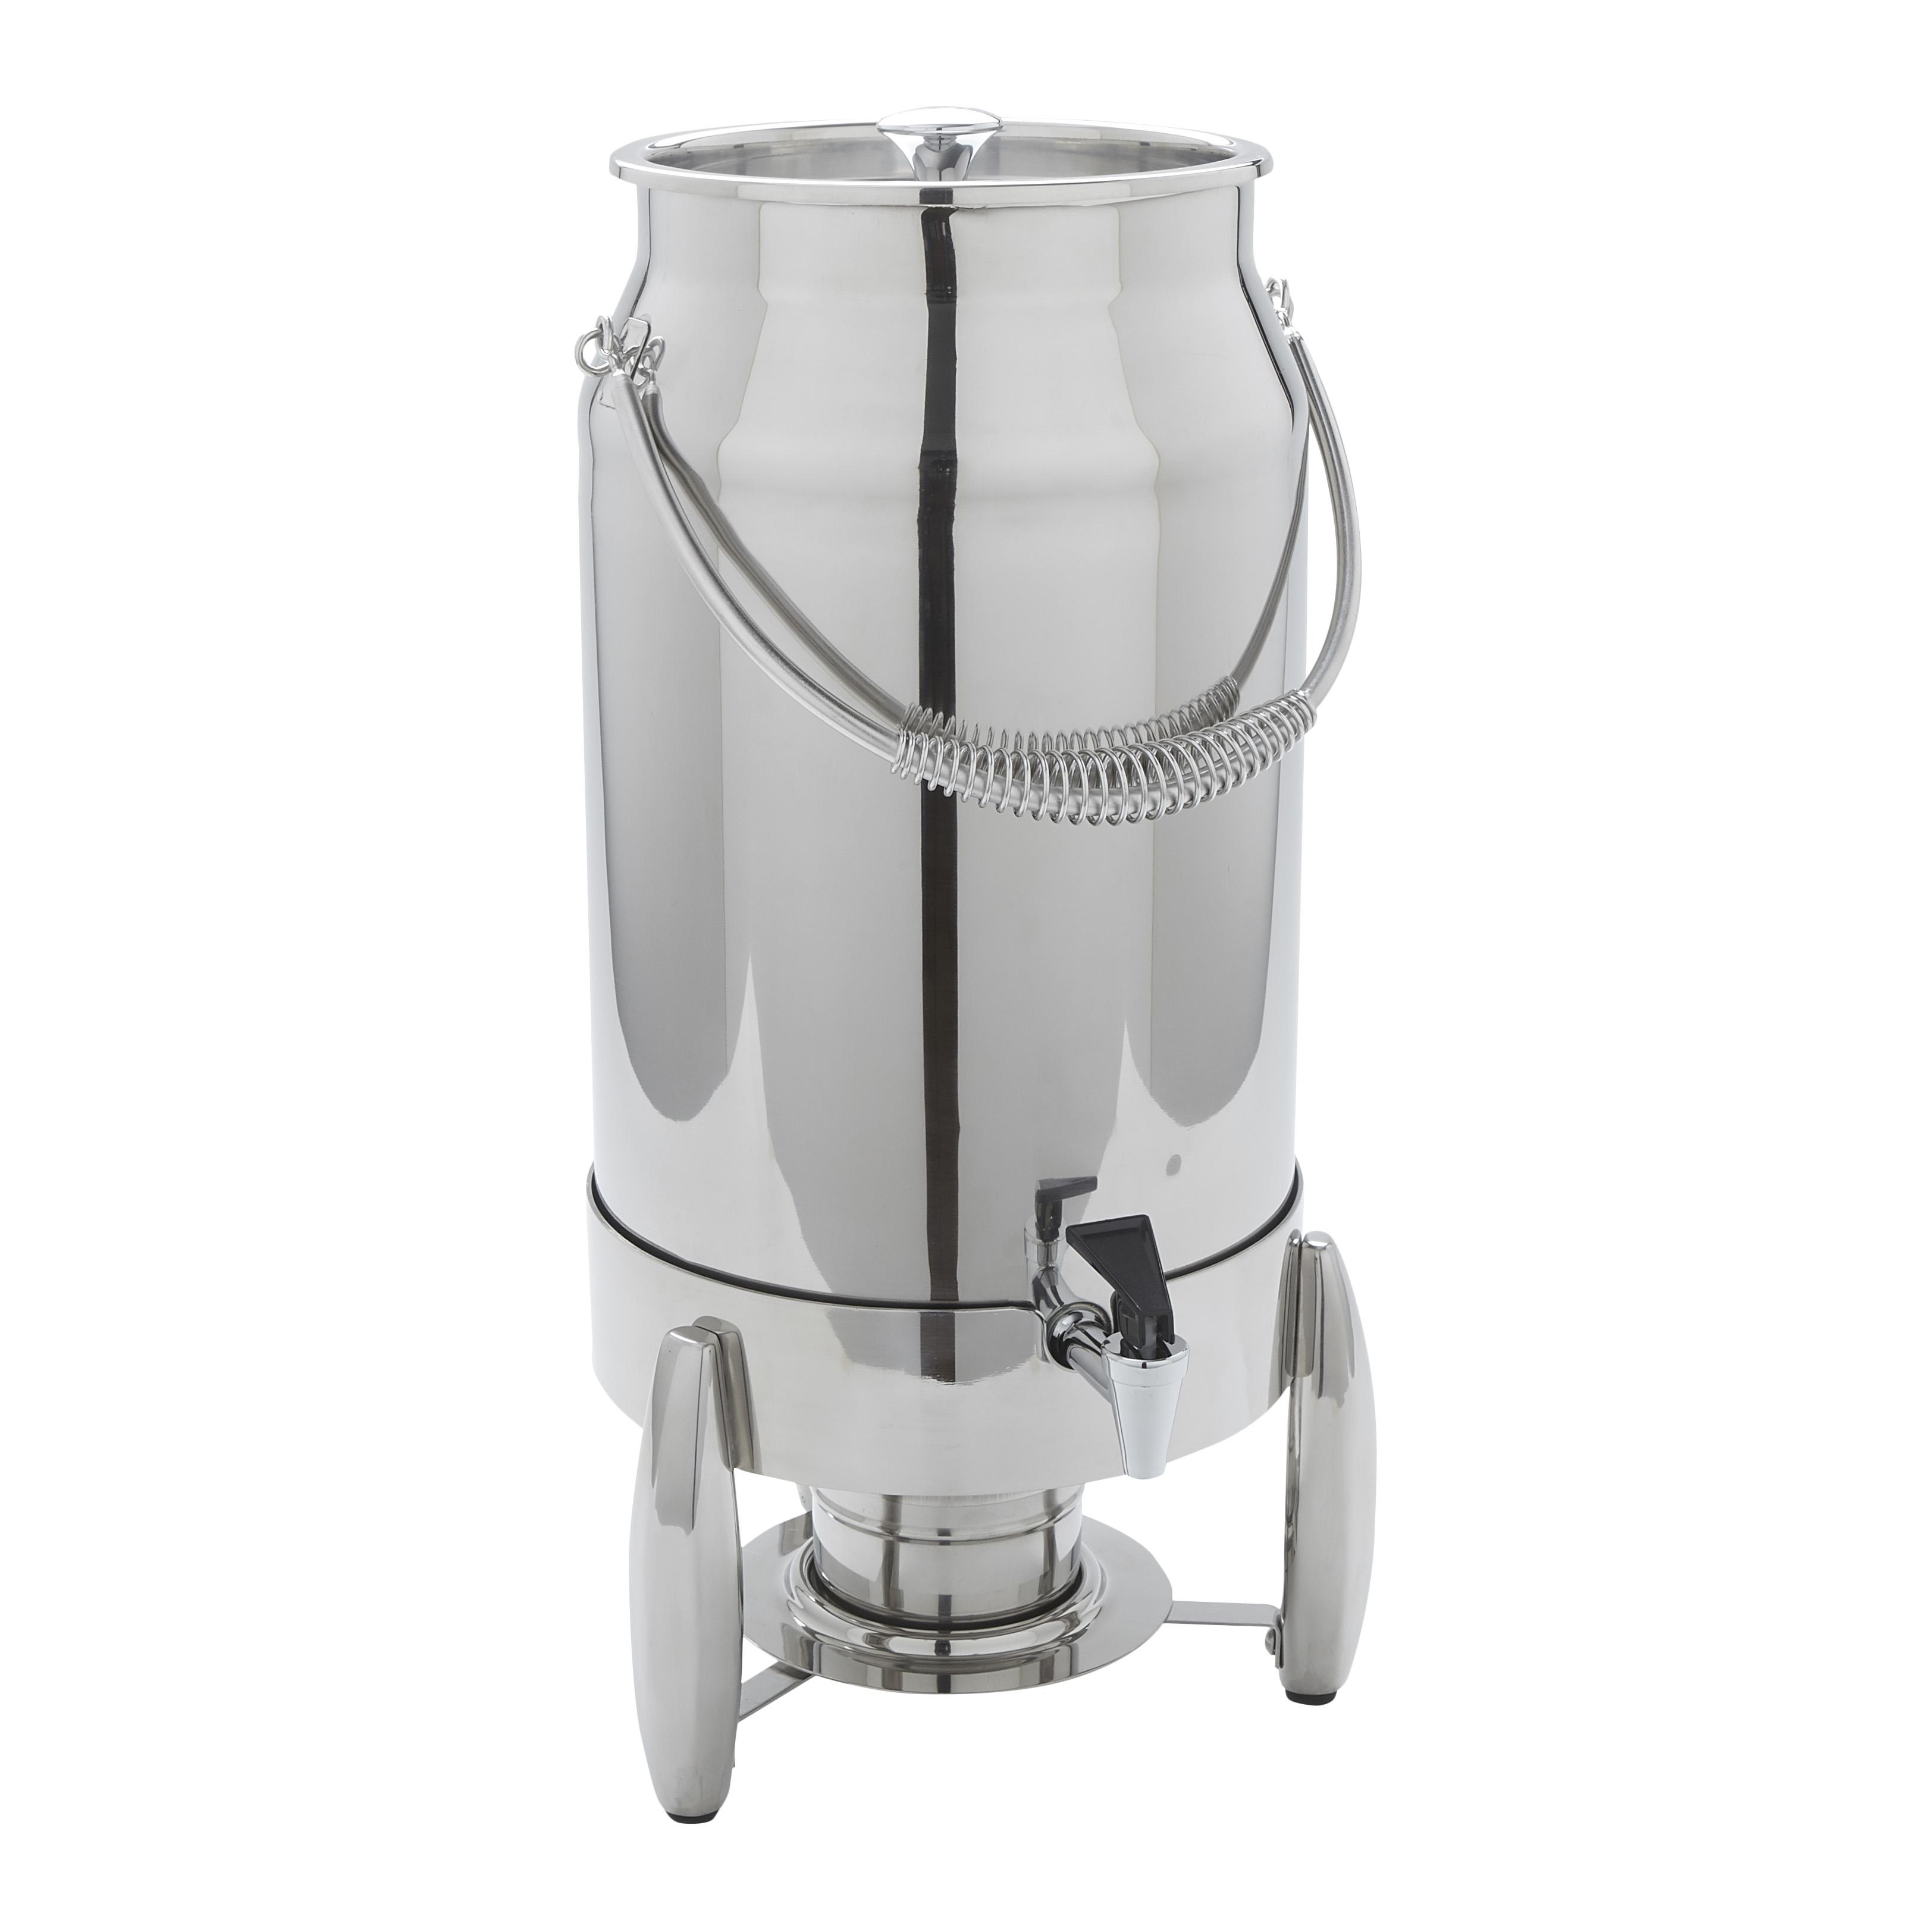 American Metalcraft REVLURN12 coffee chafer urn